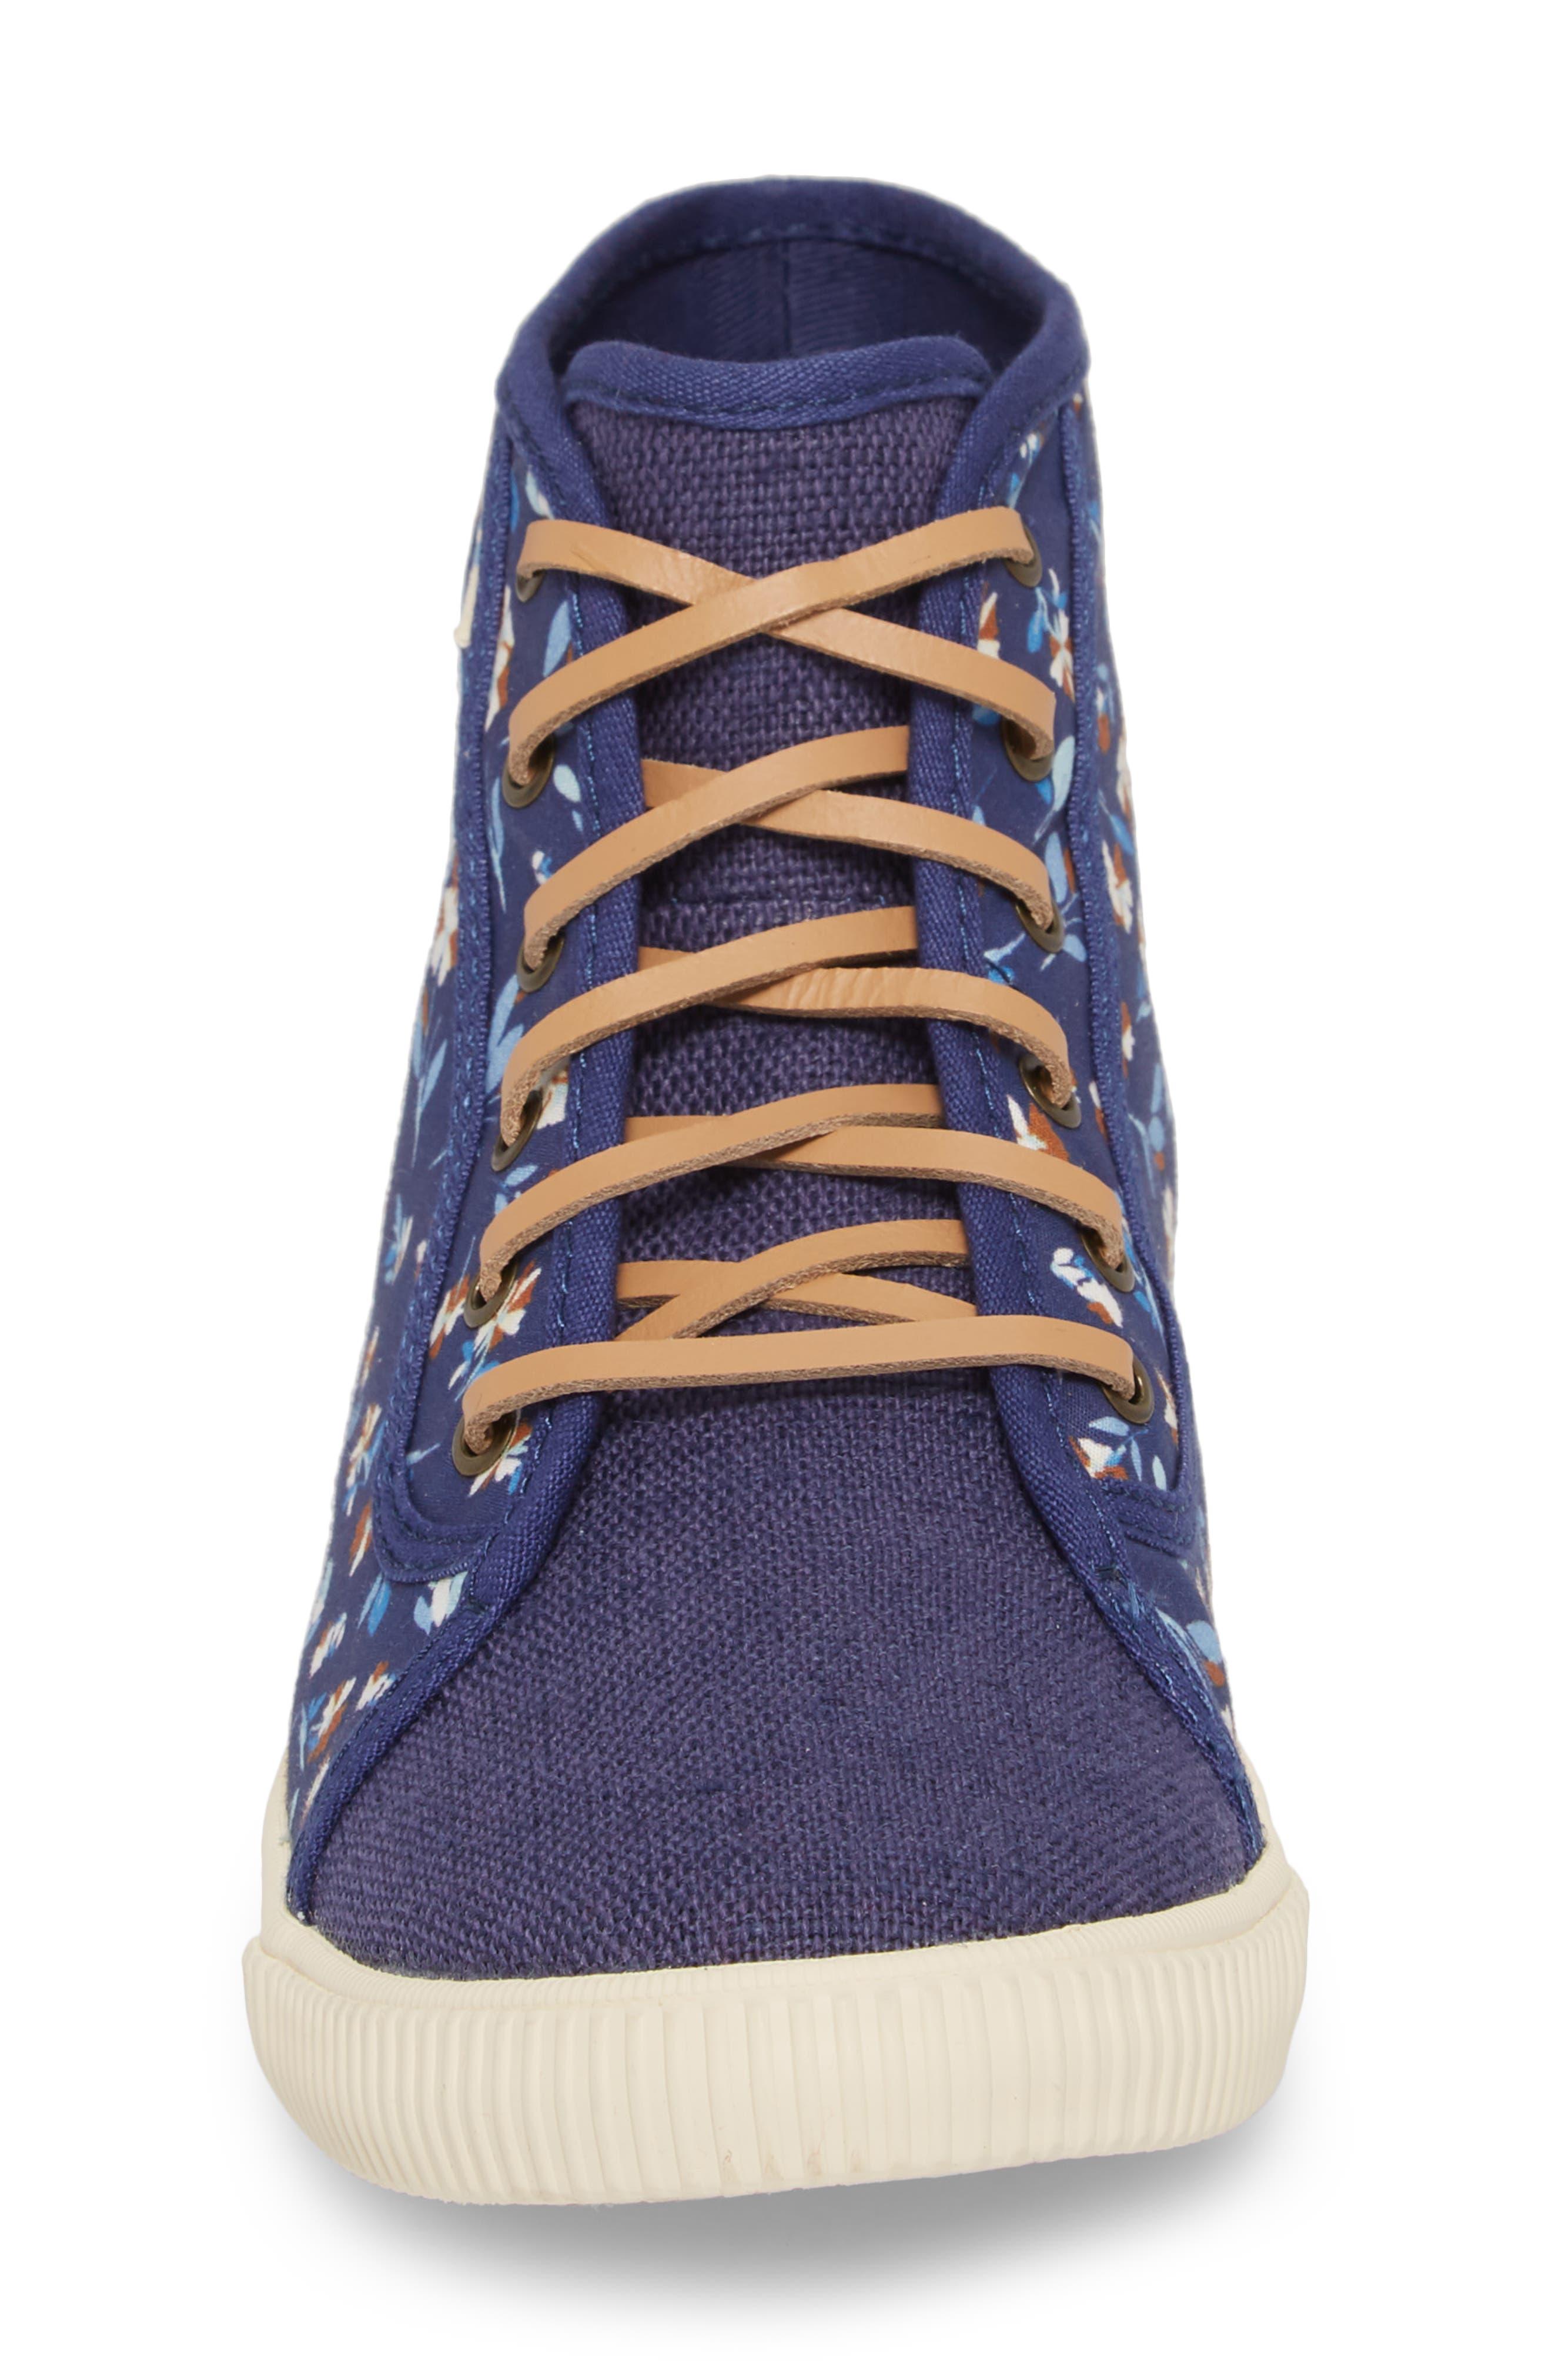 Camarillo High Top Sneaker,                             Alternate thumbnail 4, color,                             Deep Blue Vintage Flower